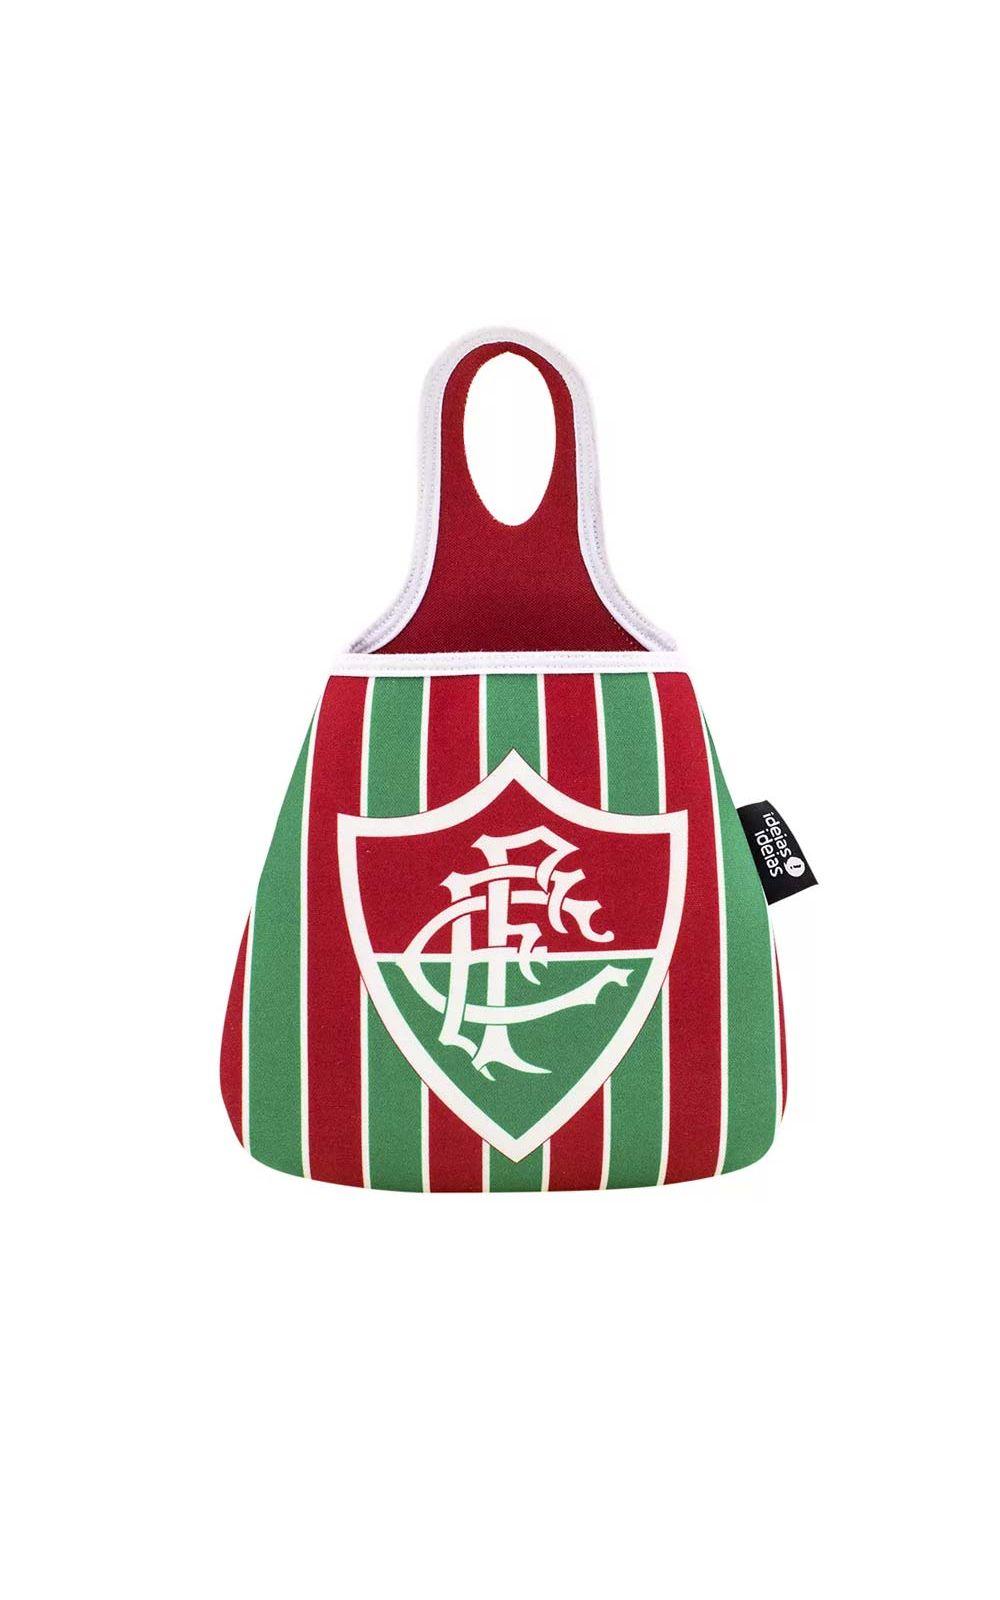 Foto 1 - Lixeira para Carro Fluminense Futebol